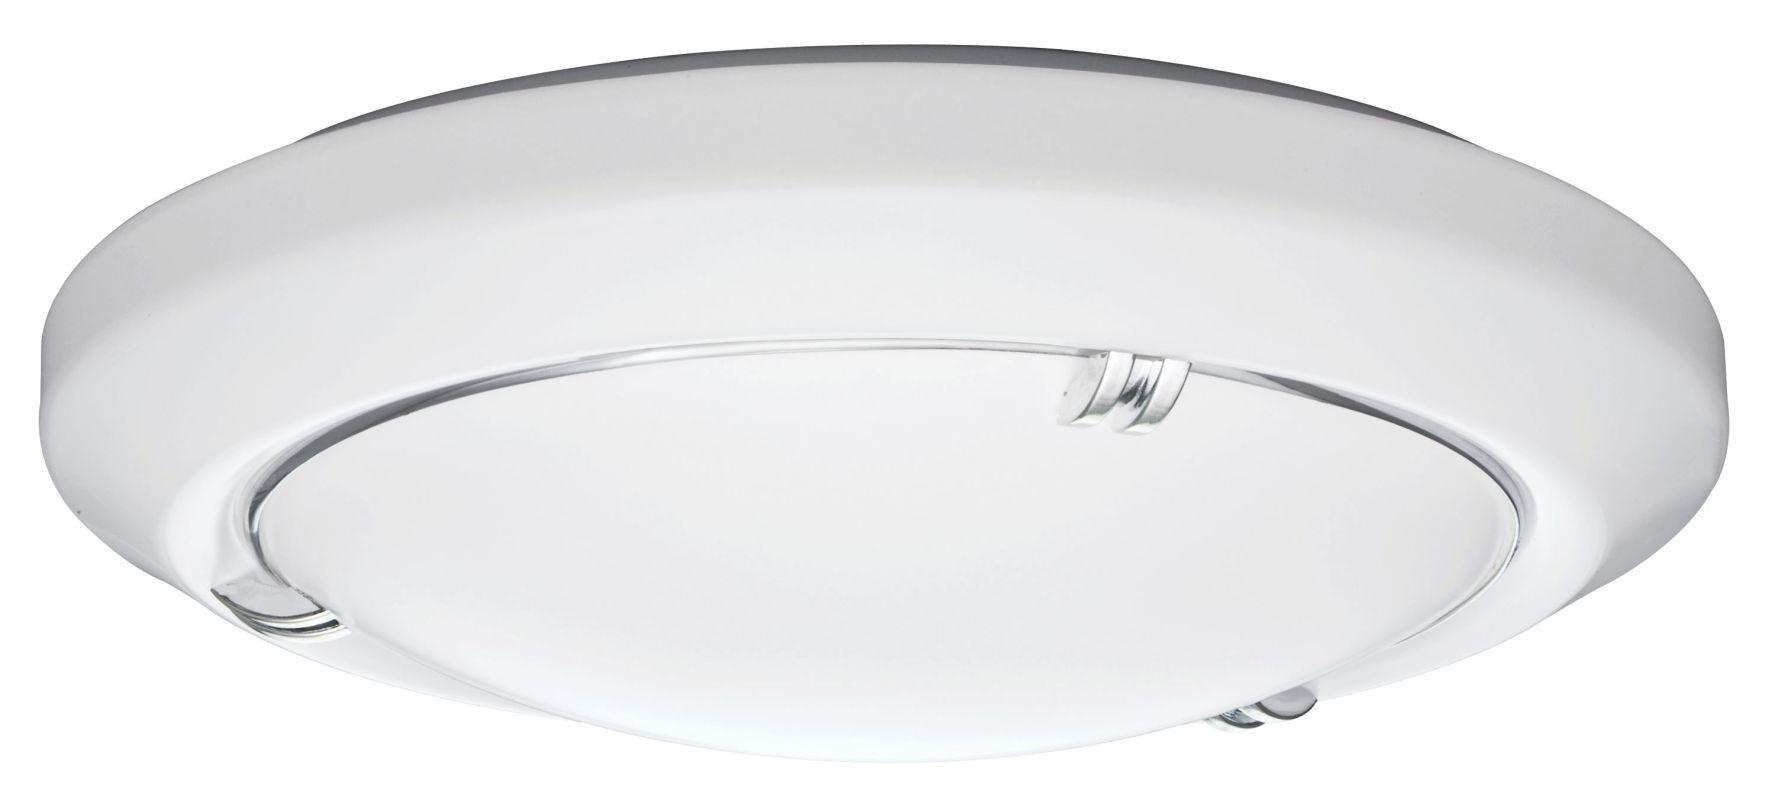 lithonia lighting fmvell 14 20830 kr m4 white vela 14 flush mount. Black Bedroom Furniture Sets. Home Design Ideas